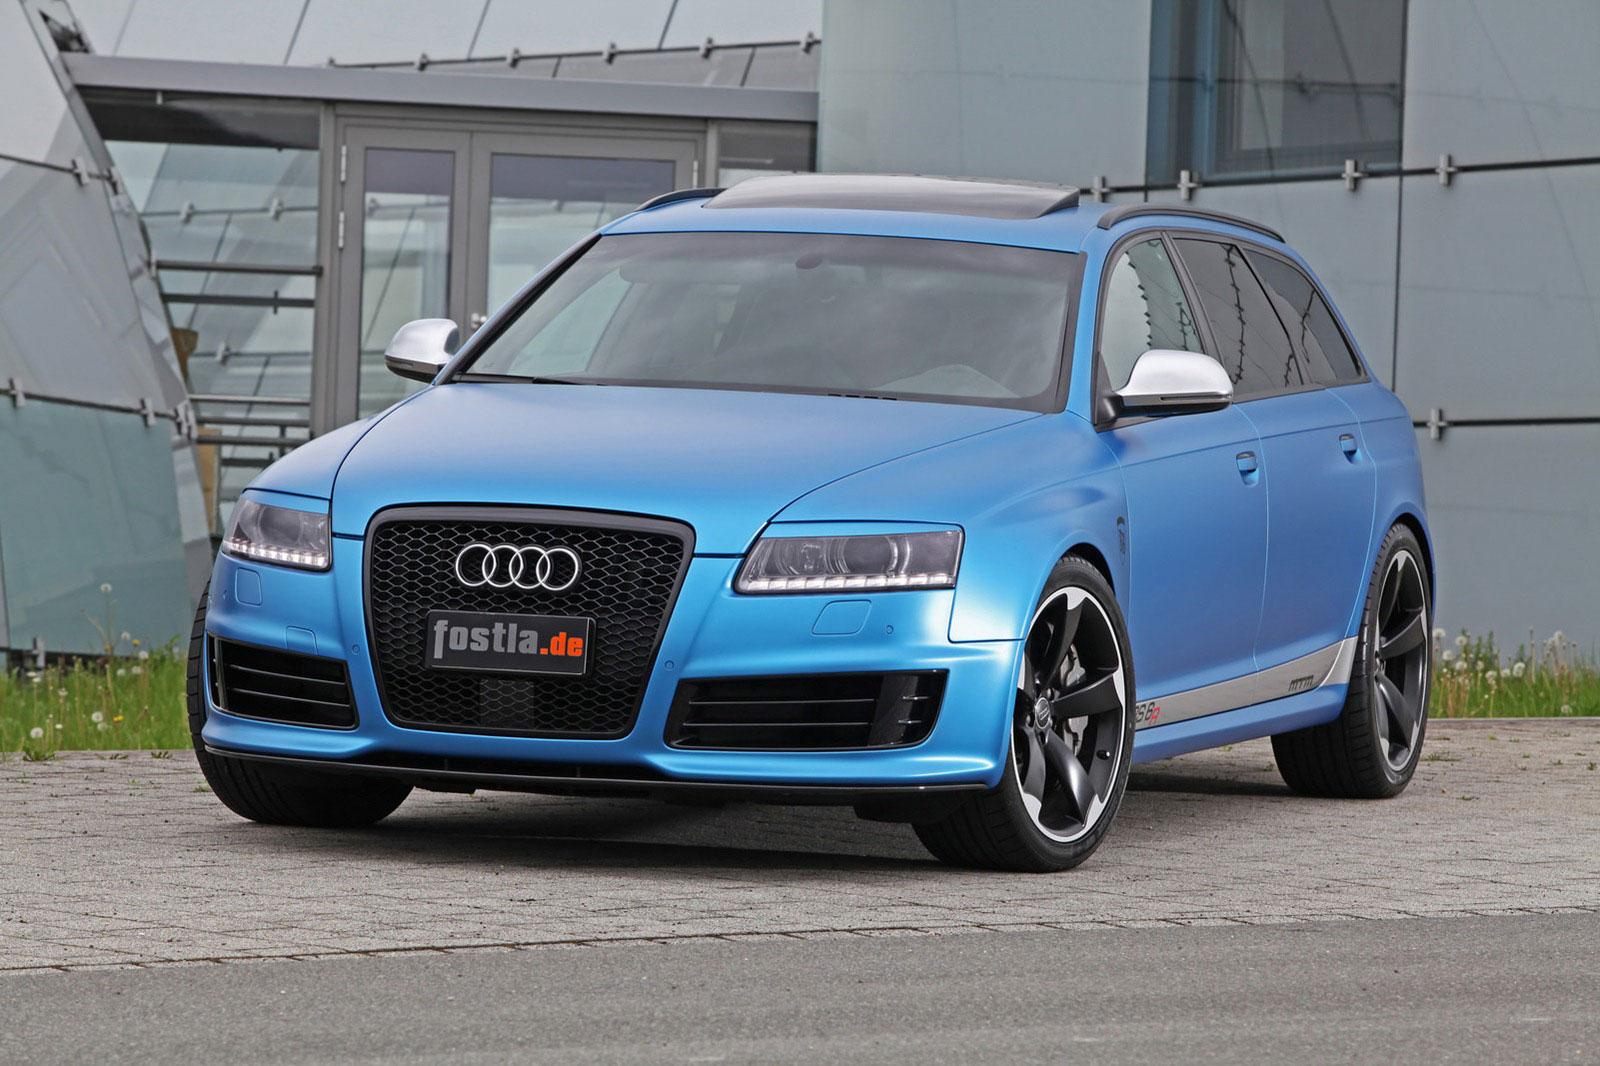 Fostla a MTM vytvořili velmi našlapané Audi RS6 Avant 6